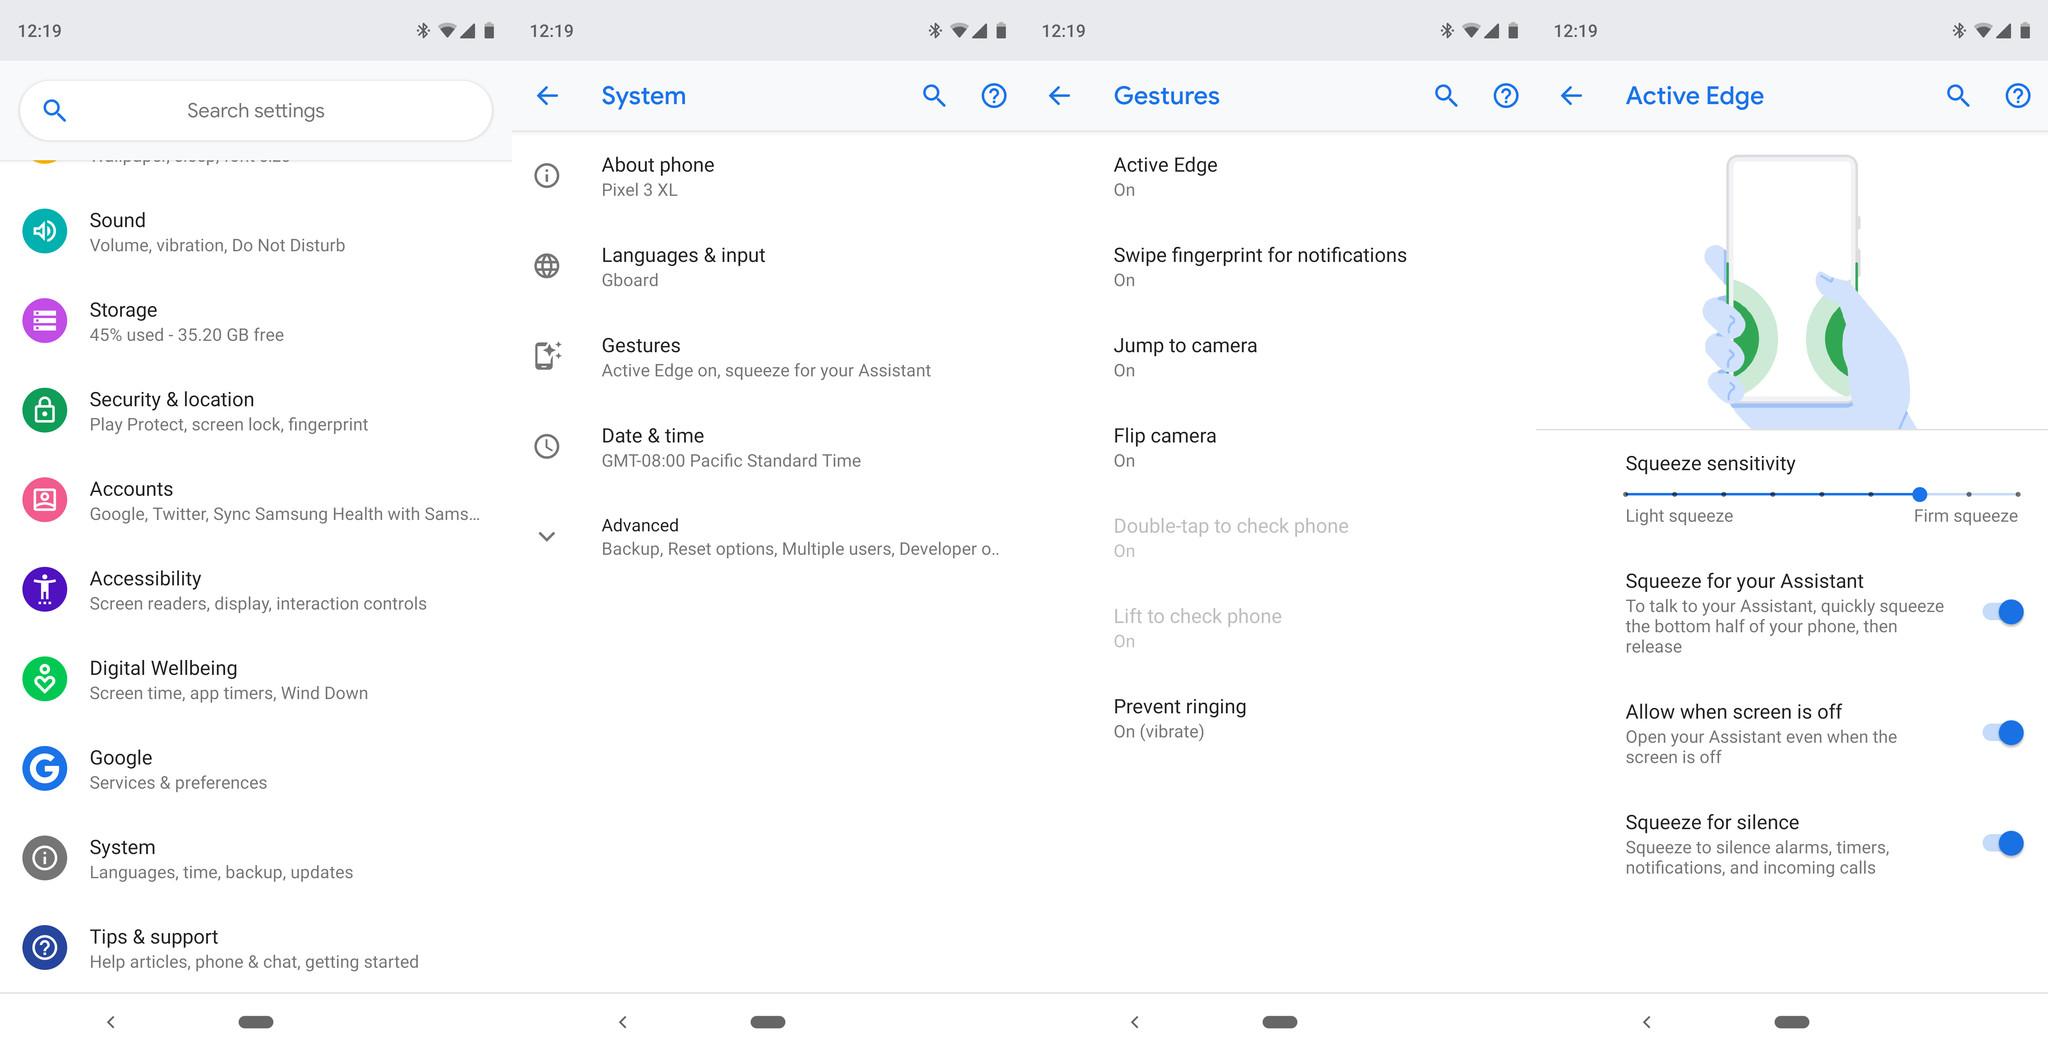 How to customize Active Edge on the Google Pixel 3 - AIVAnet